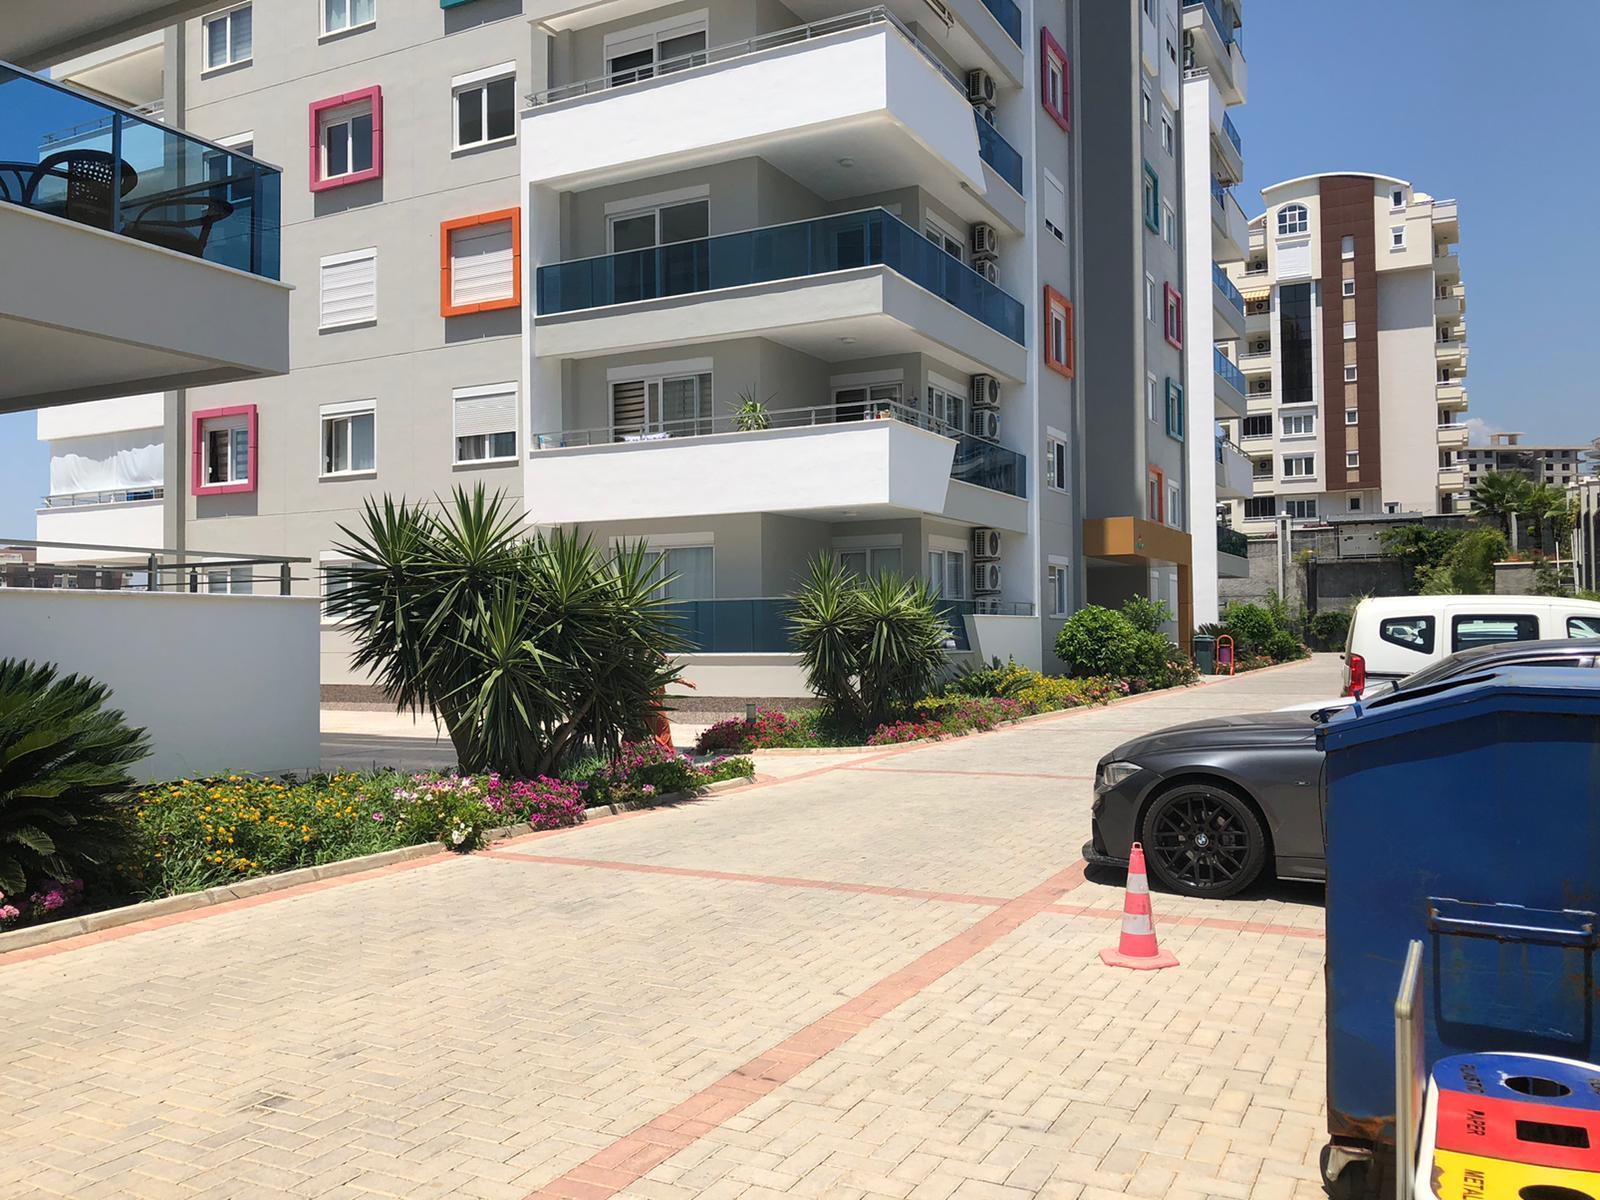 Трехкомнатная квартира в жилом комплексе в Авсаллар